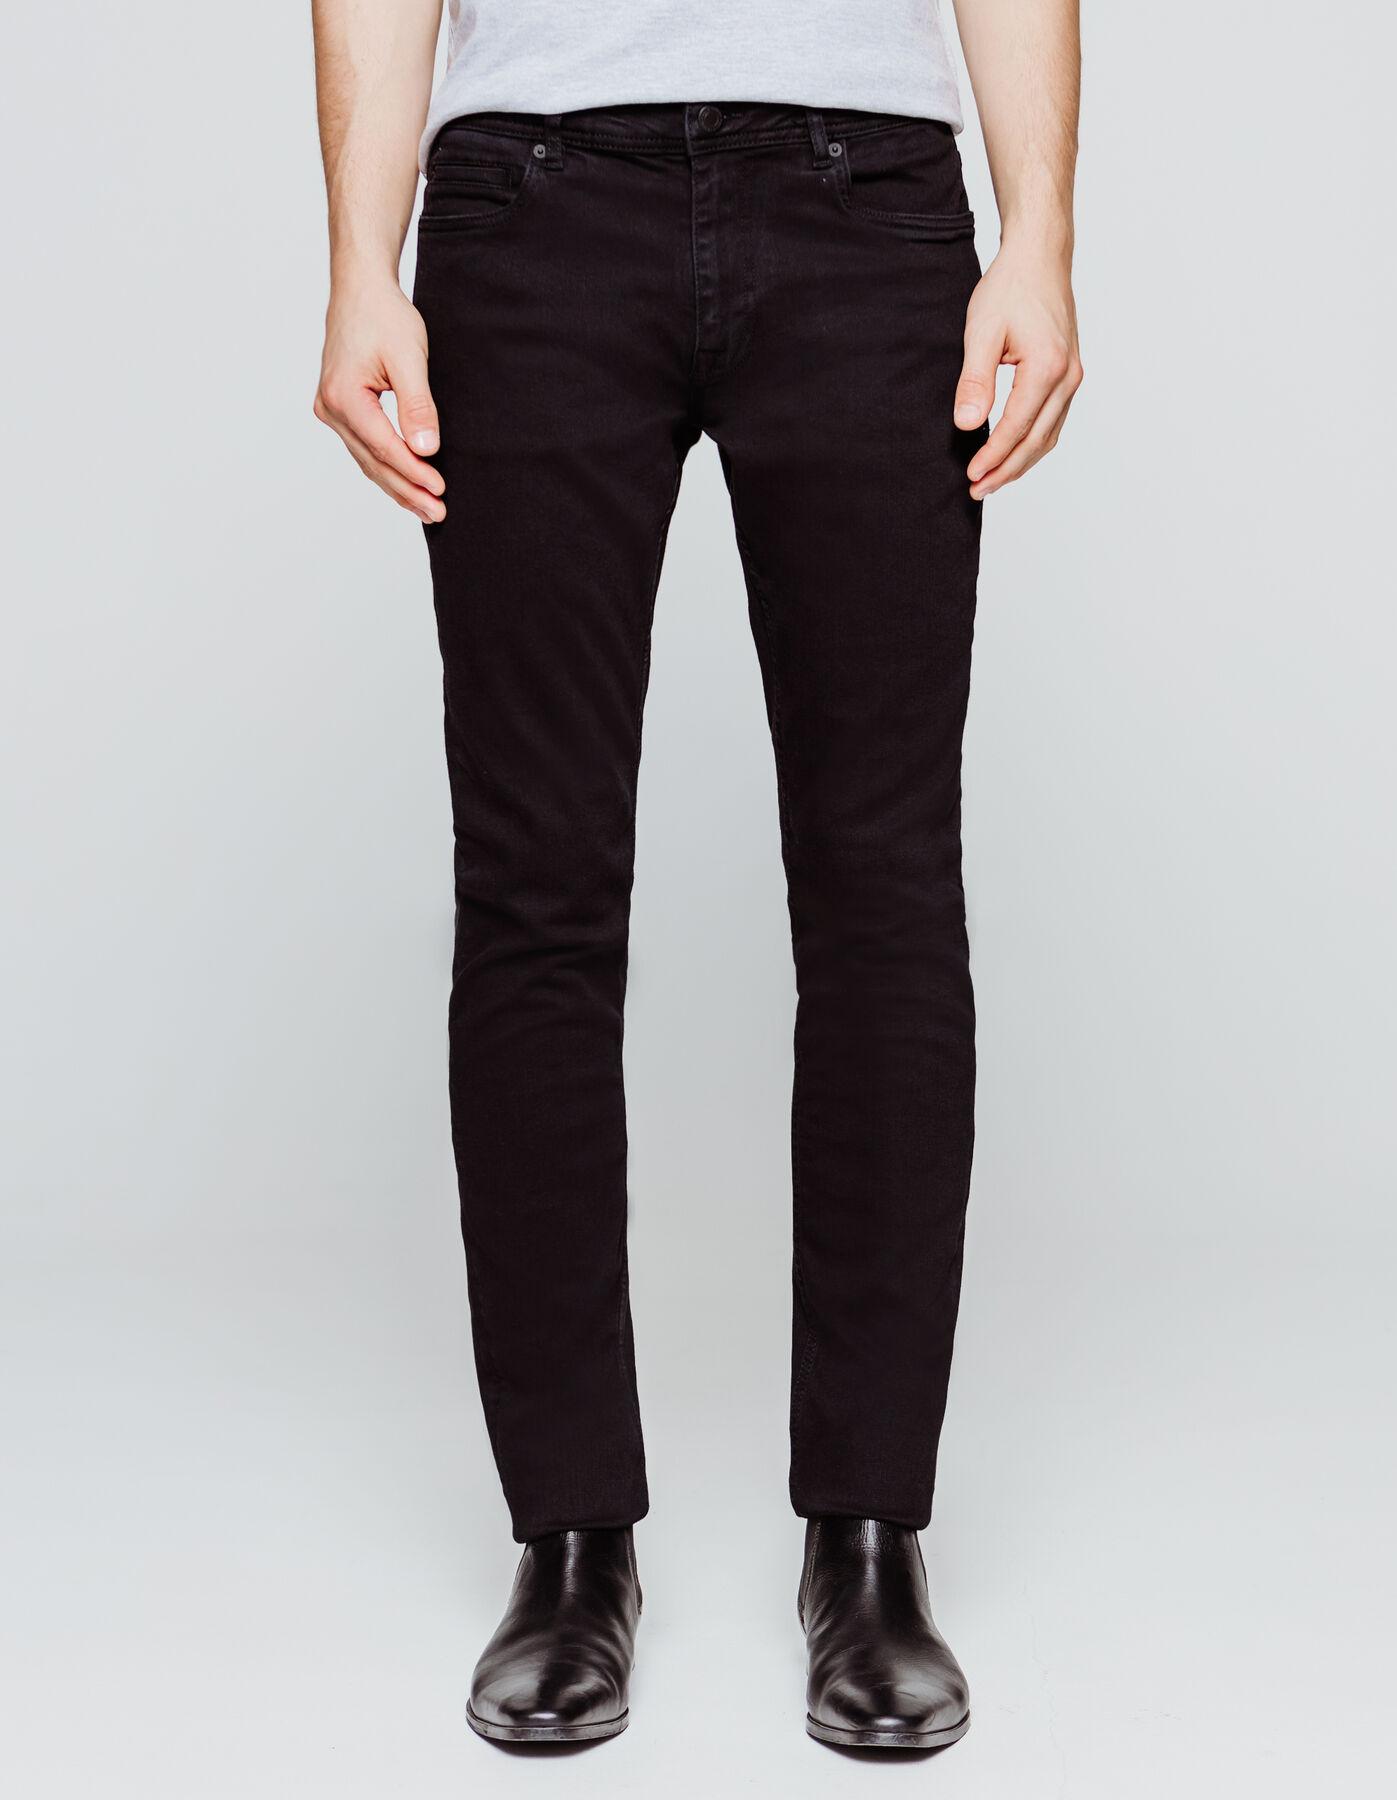 Jean slim #Tom urbanflex  noir